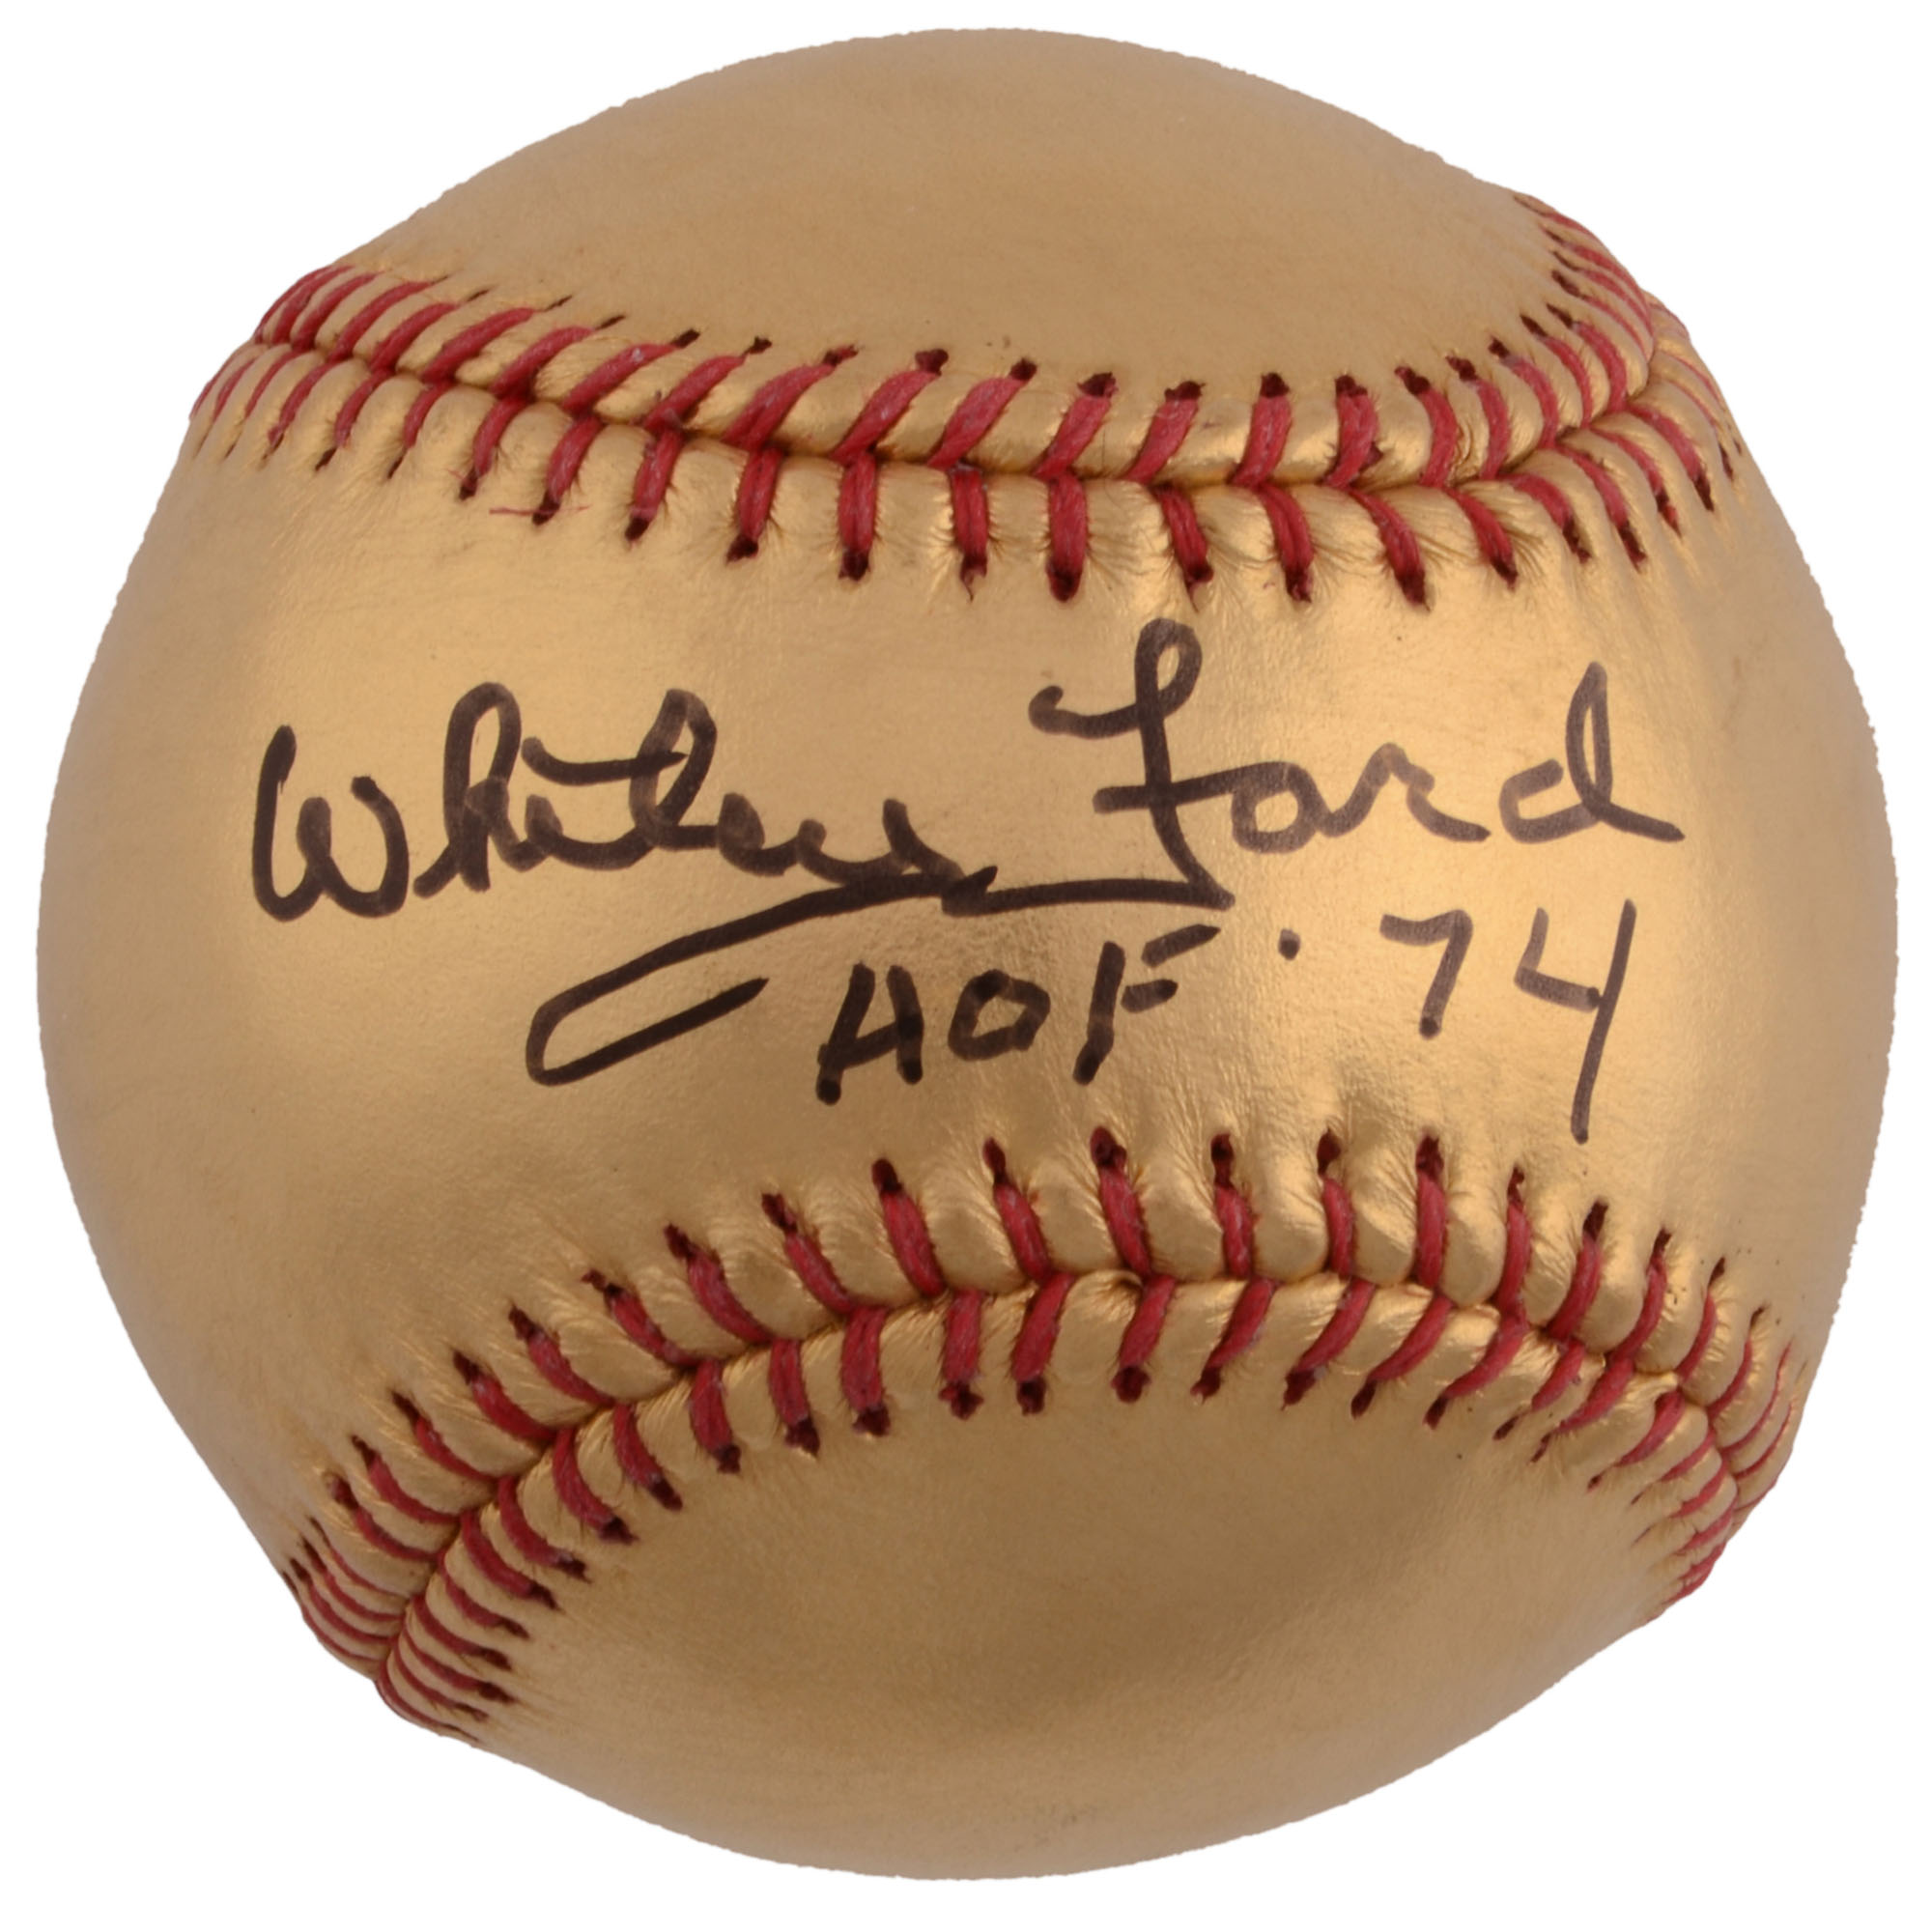 Whitey Ford New York Yankees Fanatics Authentic Autographed 24 Karat Gold Baseball with HOF 74 Inscription - No Size